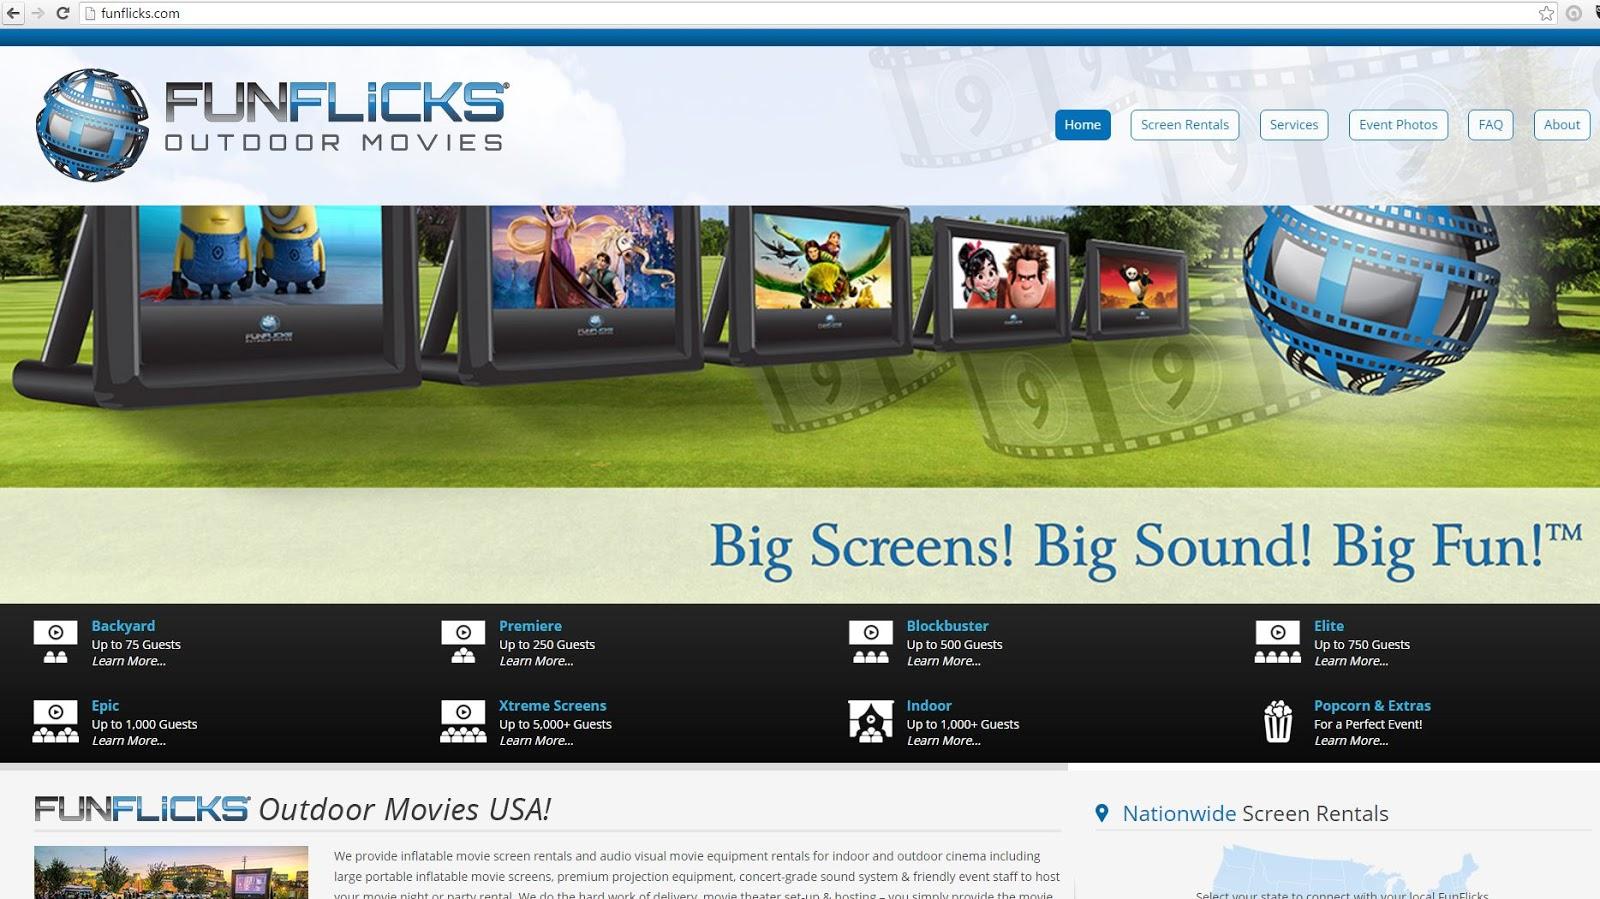 The Fun Of Outdoor Movies New Funflicks Outdoor Movie Website